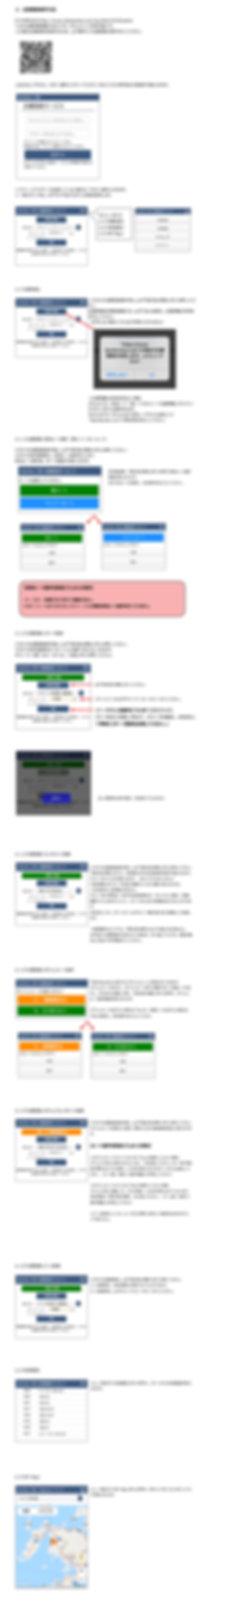 S500操作マニュアルjpeg2.jpg